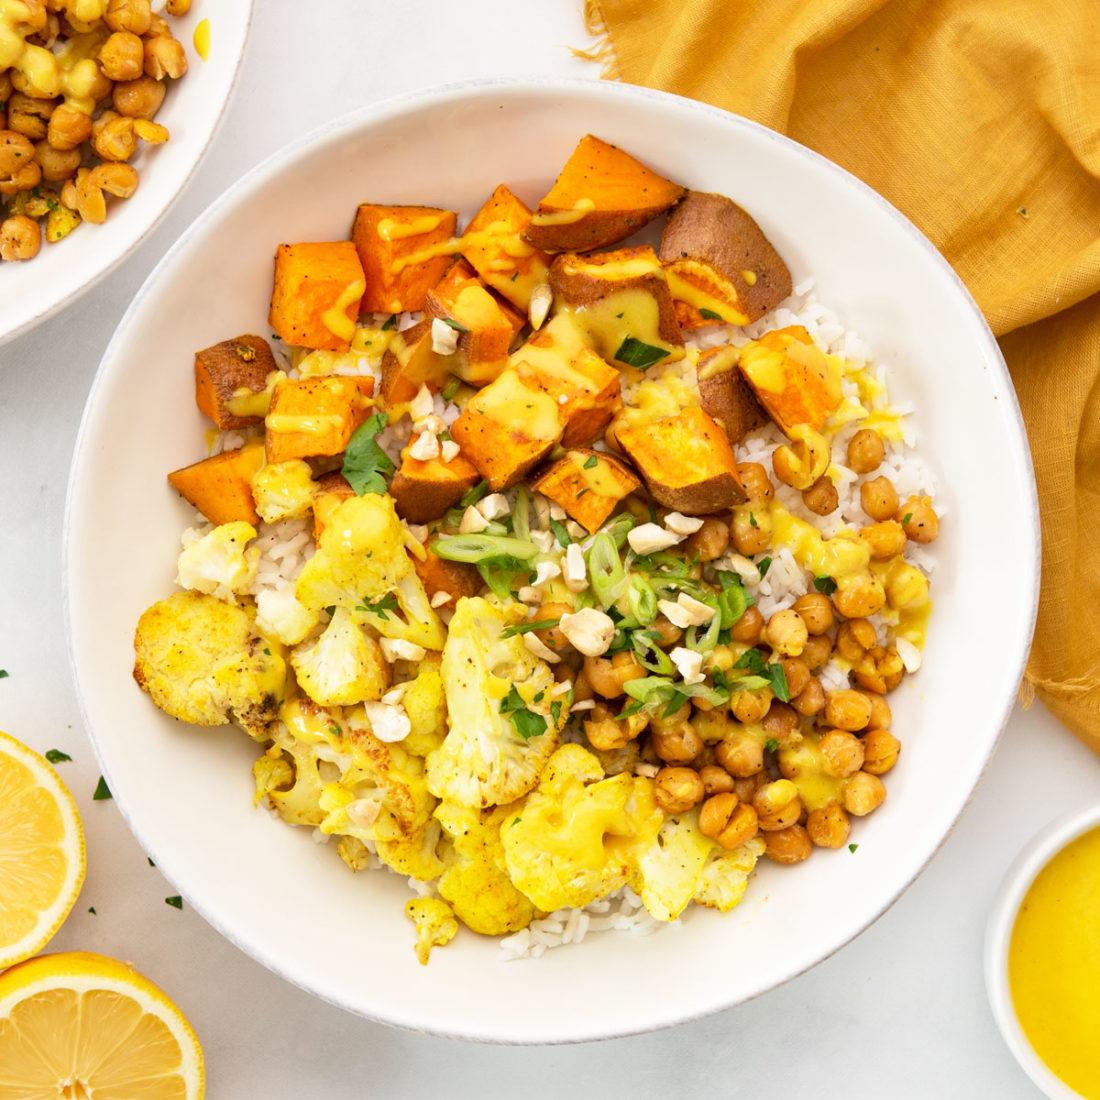 a bowl layered with rice, chickpeas, sweet potatoes, cauliflower, and lemon turmeric sauce